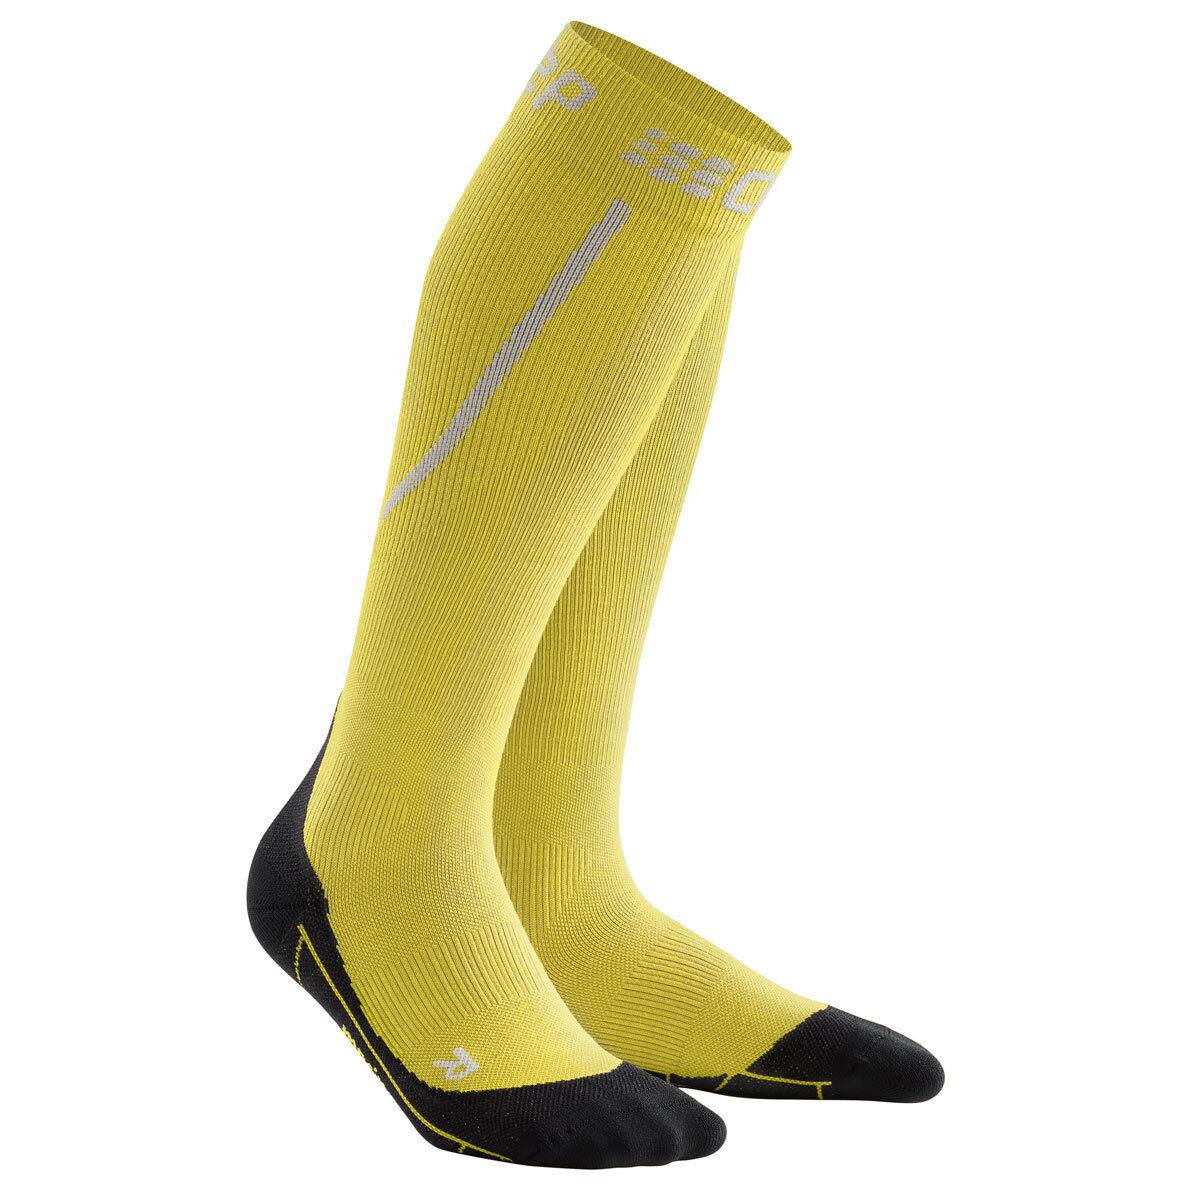 CEP Winter Run SOCKS Uomo Merino giallo nero   wp50gu Novità